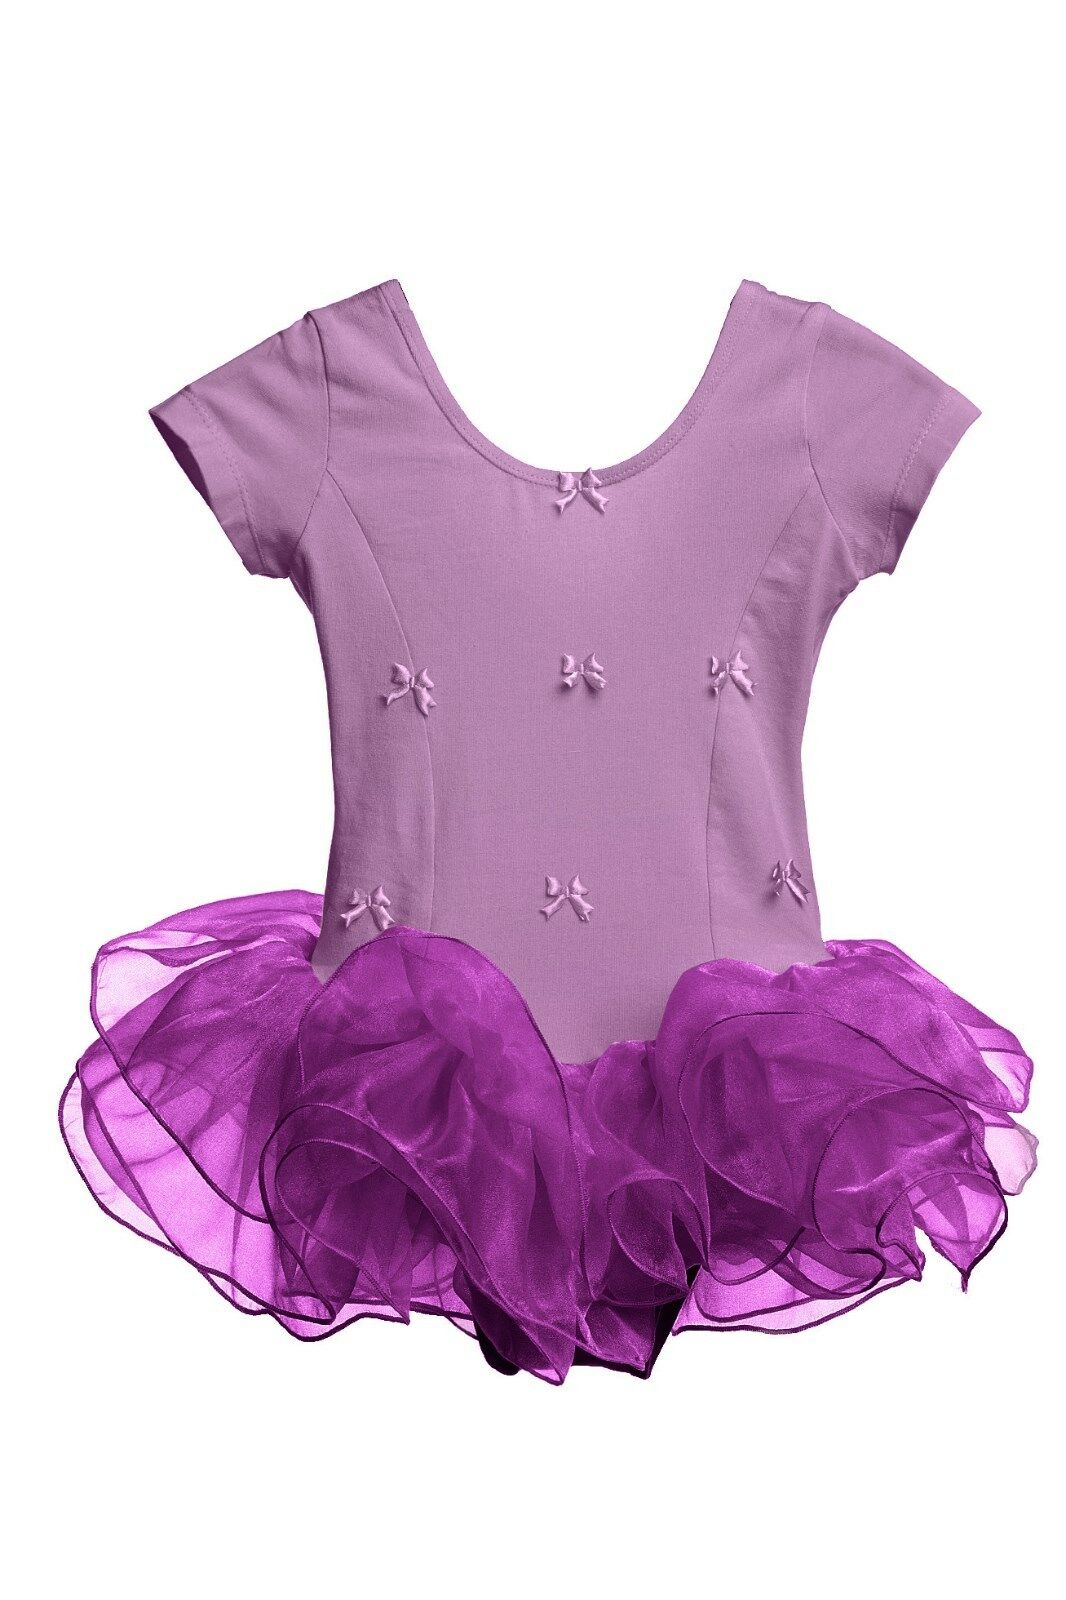 Girls Ballet Dress Dance Tutu Dress Purple Pink 2 3 4 5 6 7 Years